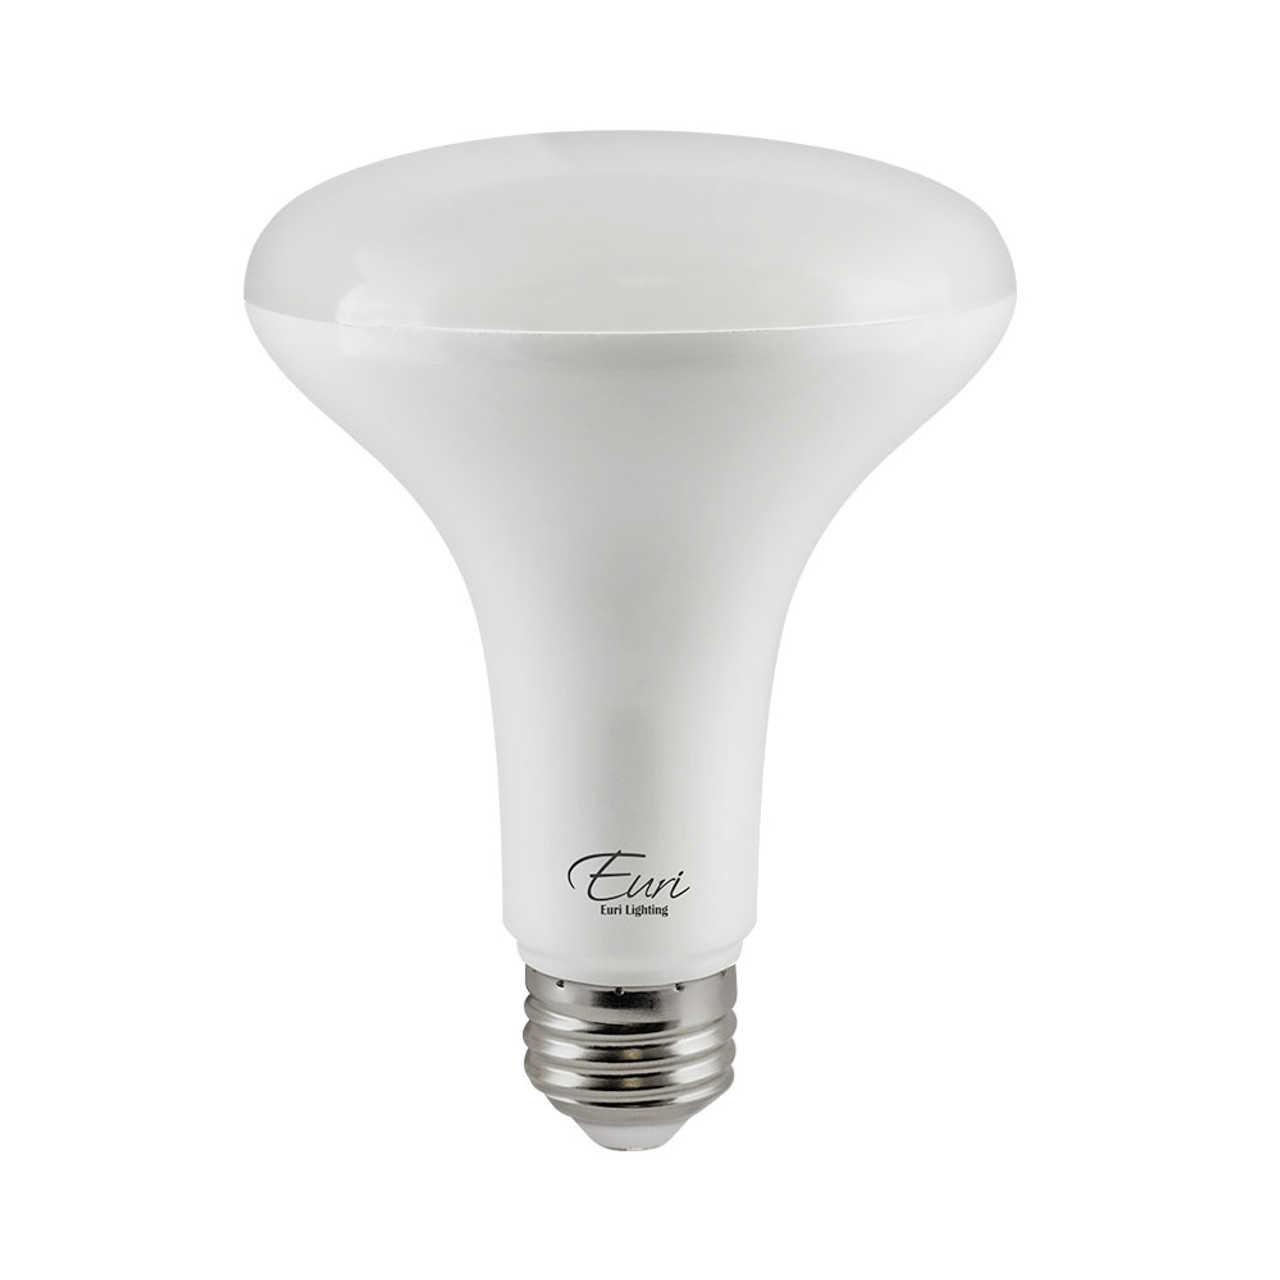 BR30, Directional (Flood), LED Light Bulb, Dimmable, 11 W, 120 V, 850 lm, 5000 K, E26 Base (EB30-11W3050e)